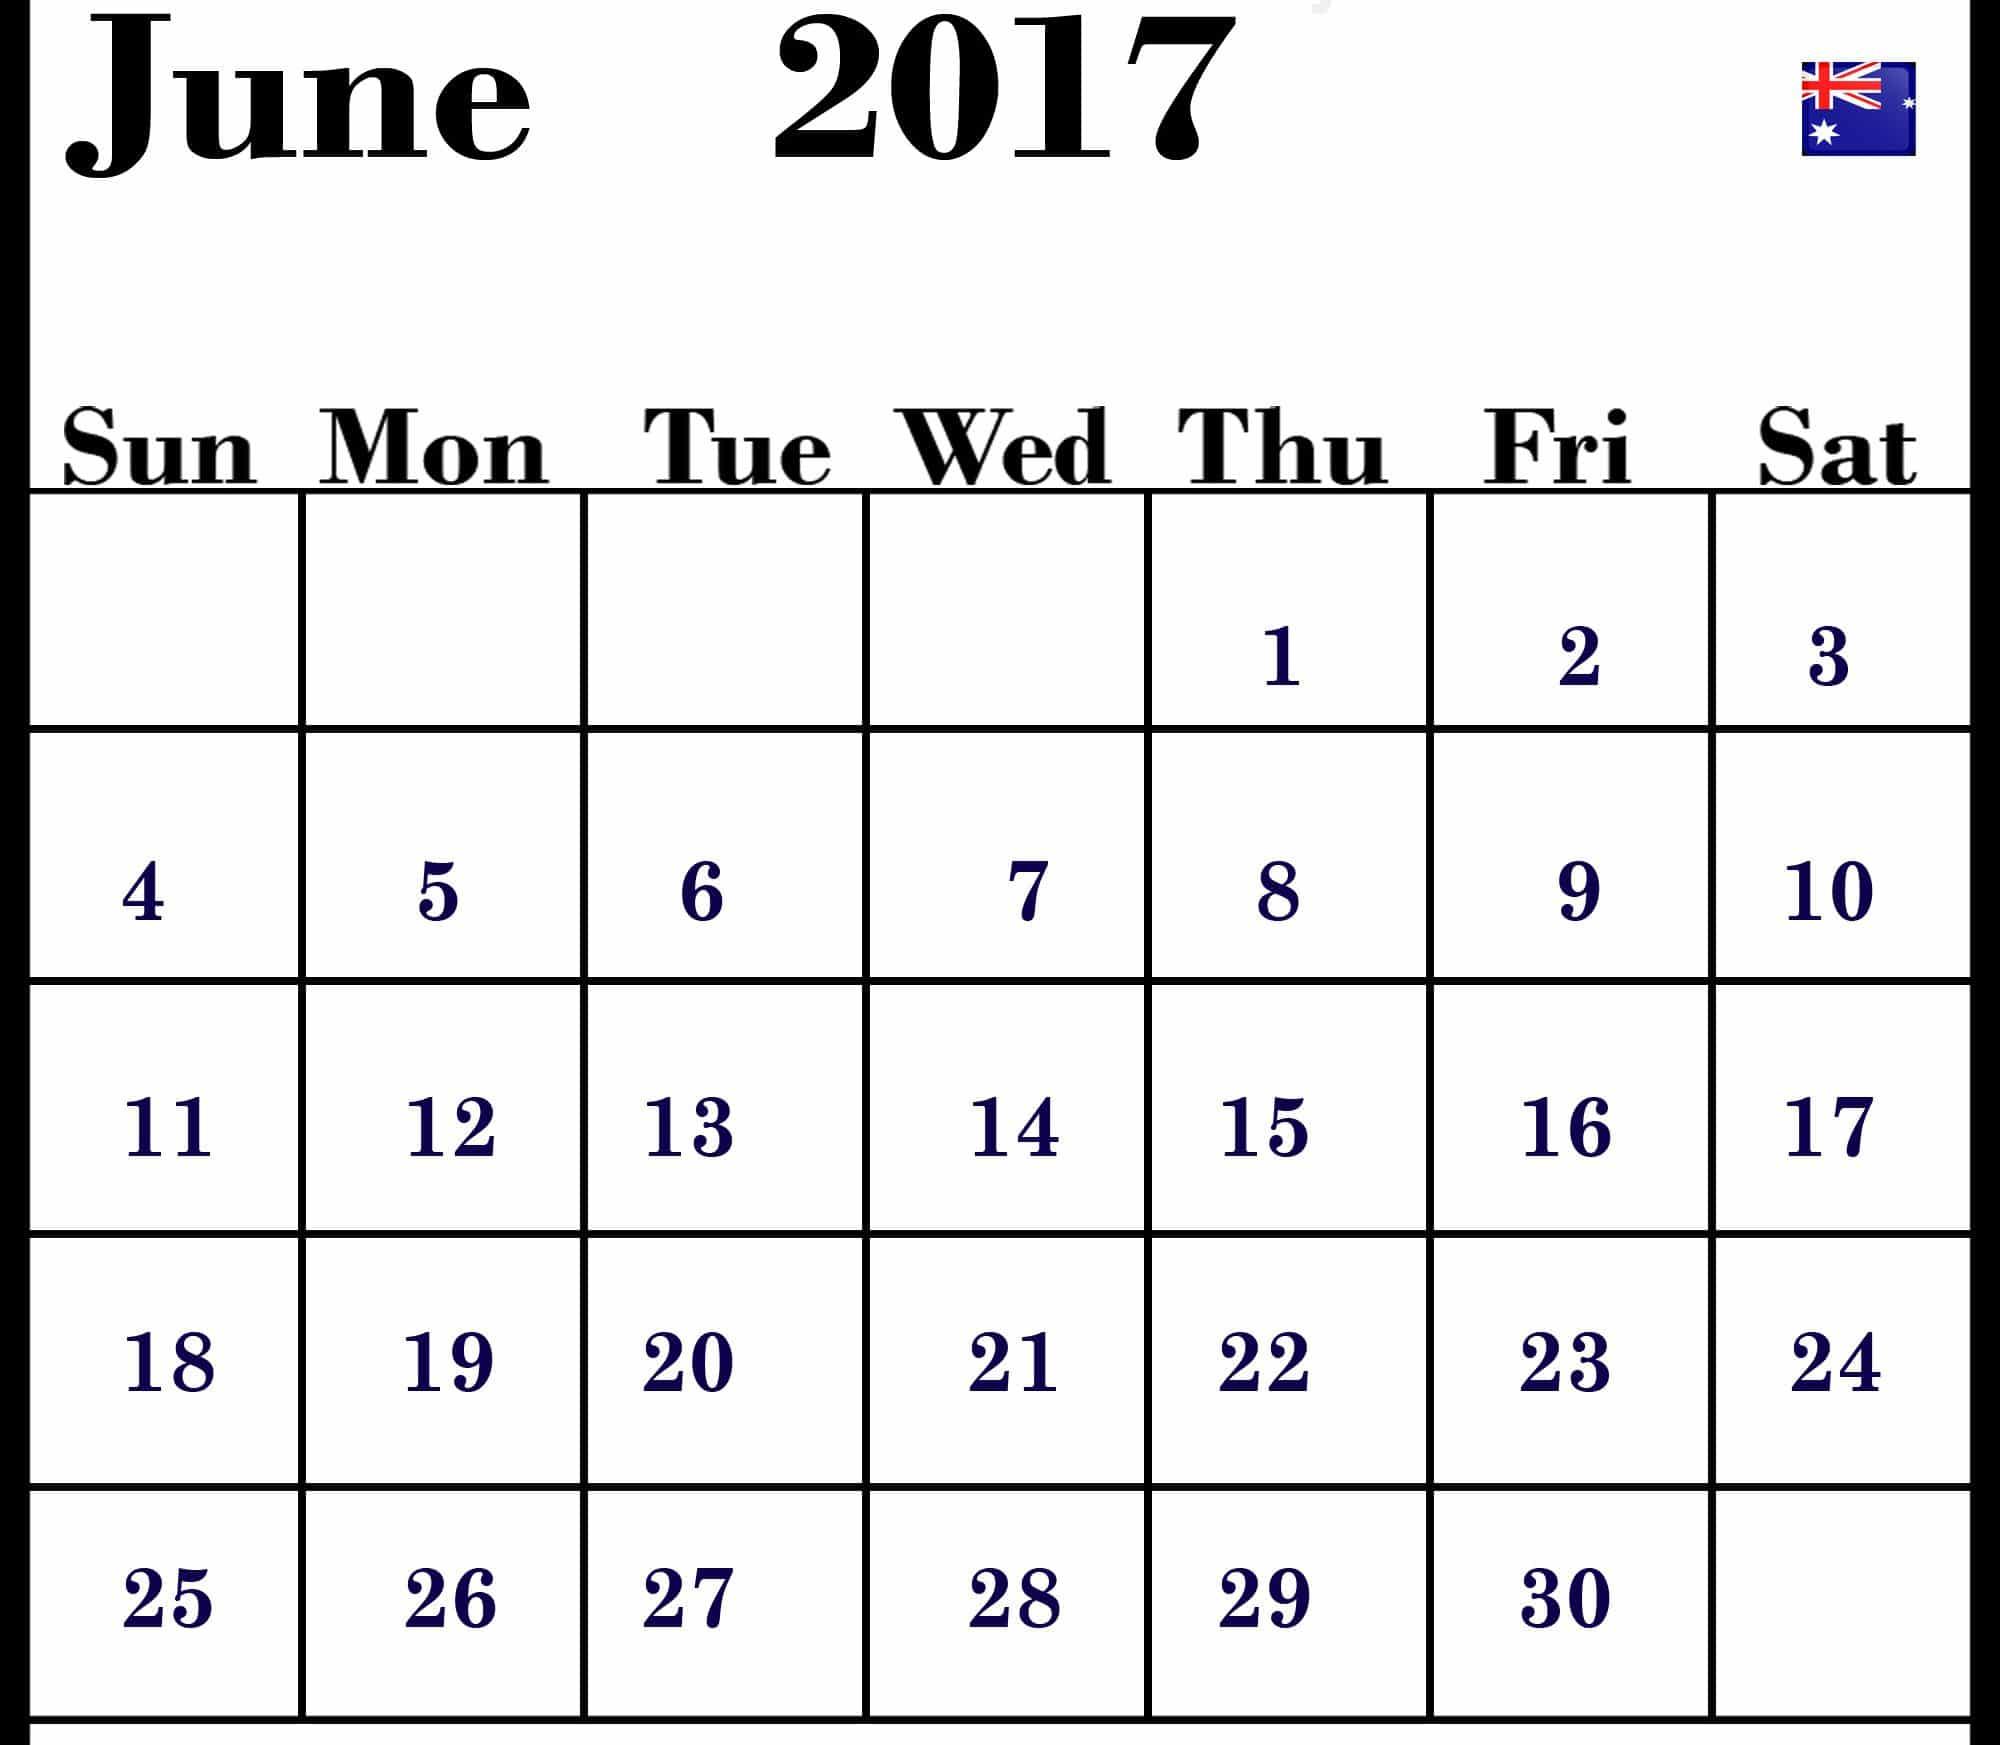 June 2017 calendar Chart Australia